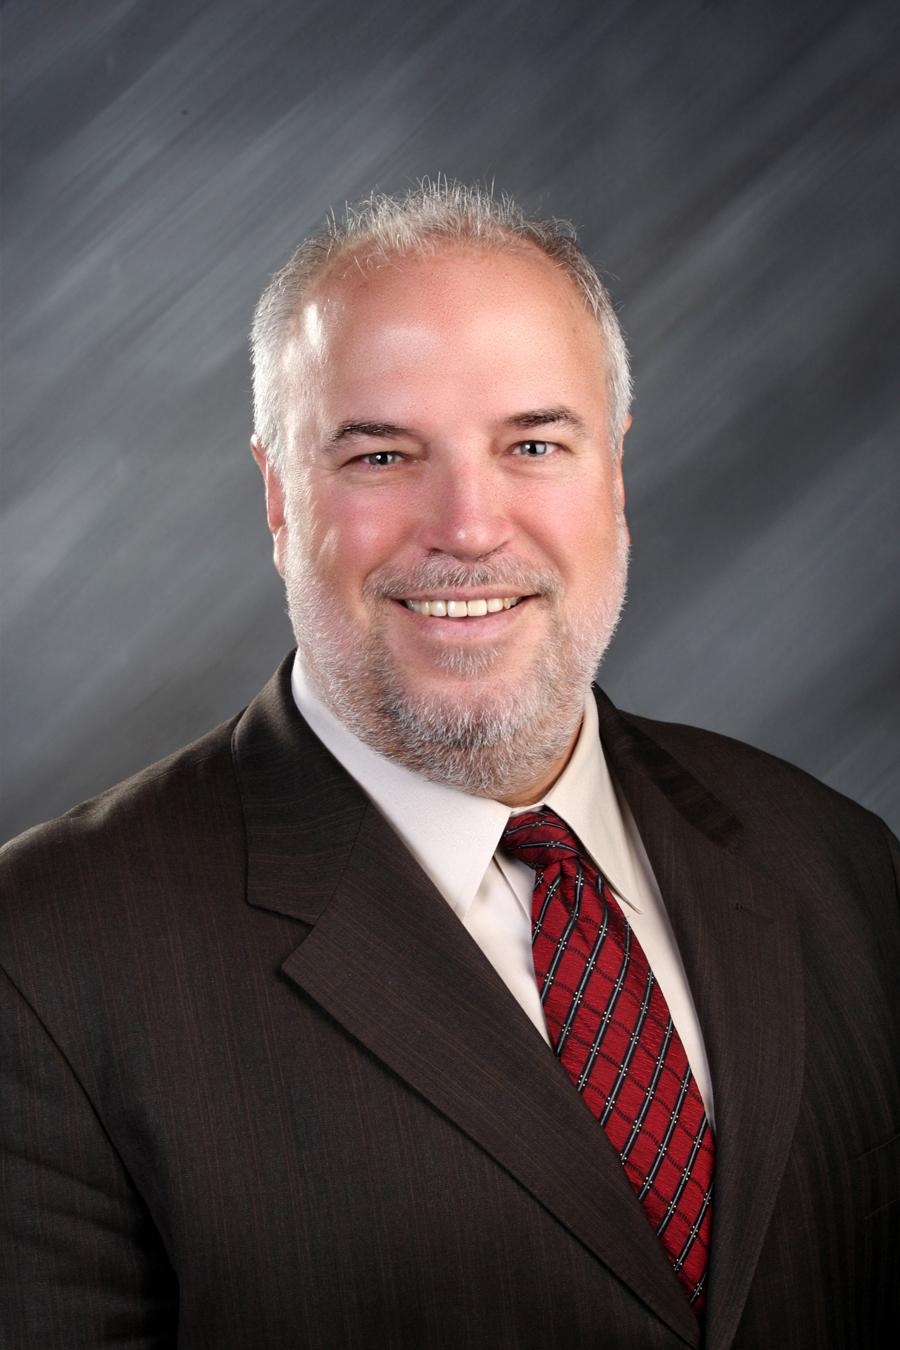 GREGORY R. MEEDER IMMEDIATE PAST PRESIDENT PARTNER HOLLAND & KNIGHT, LLP